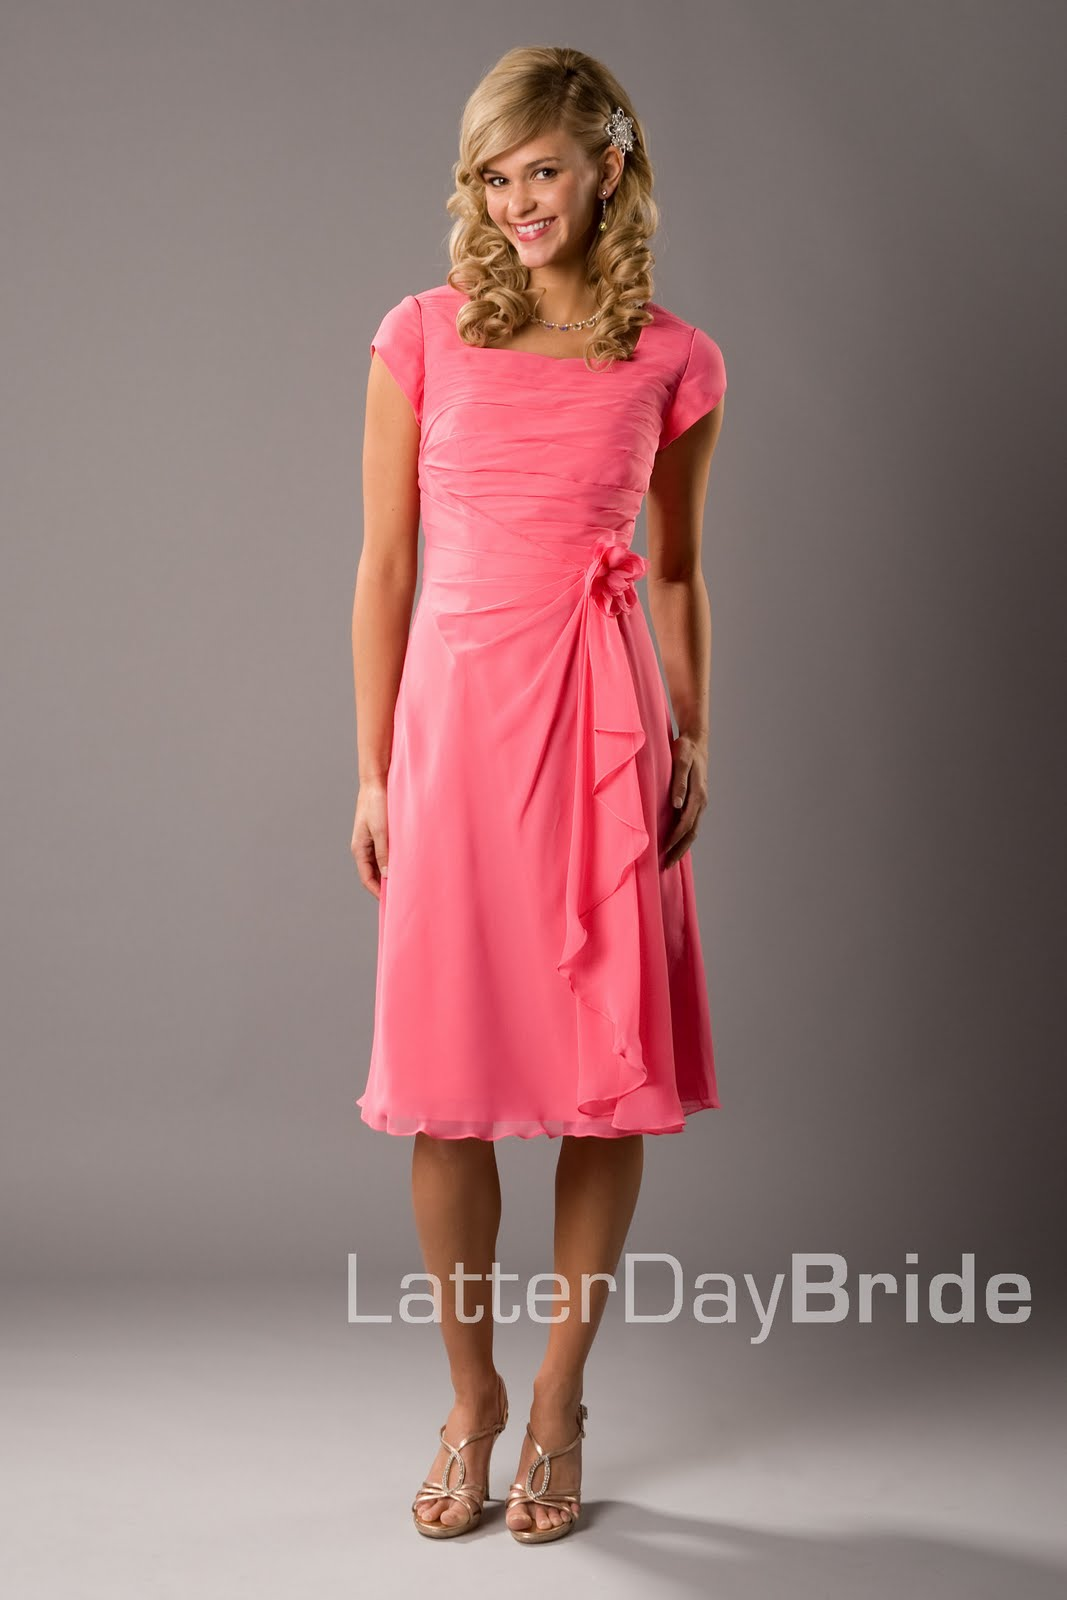 Latter day saint wedding dresses wedding dresses in jax for Latter day wedding dresses